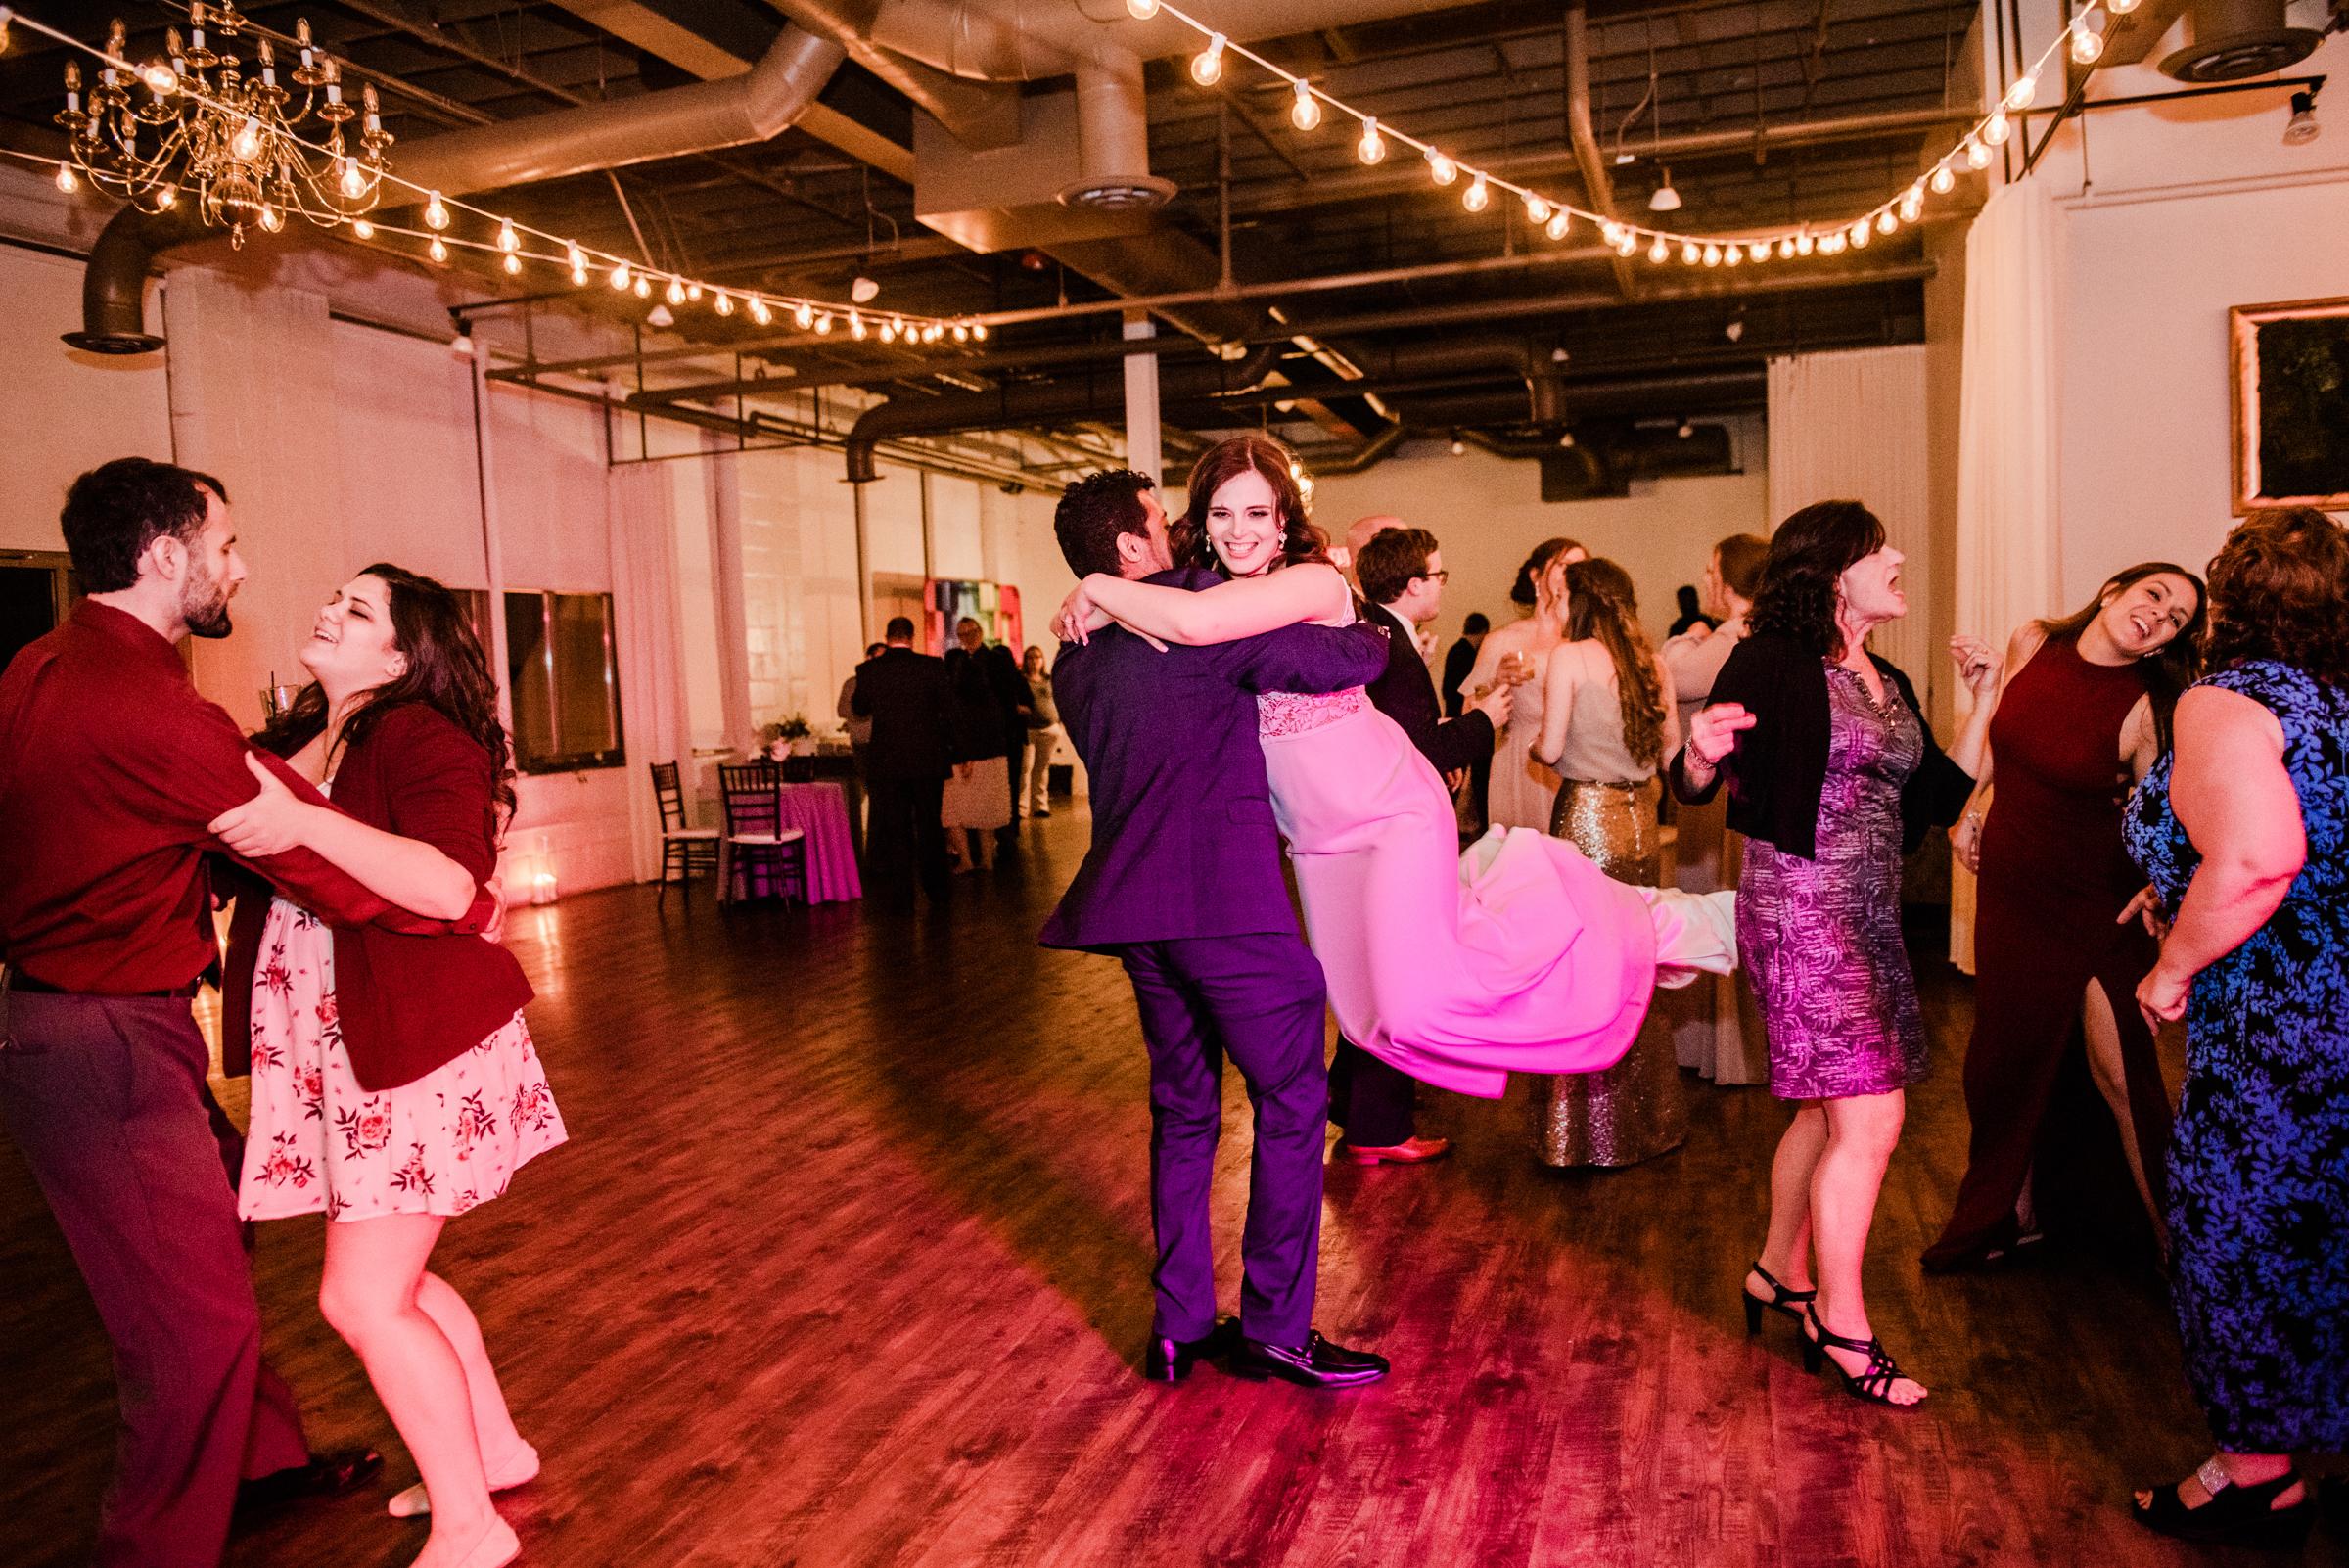 The_Arbor_LoftRochester_Wedding_JILL_STUDIO_Rochester_NY_Photographer_203929.jpg